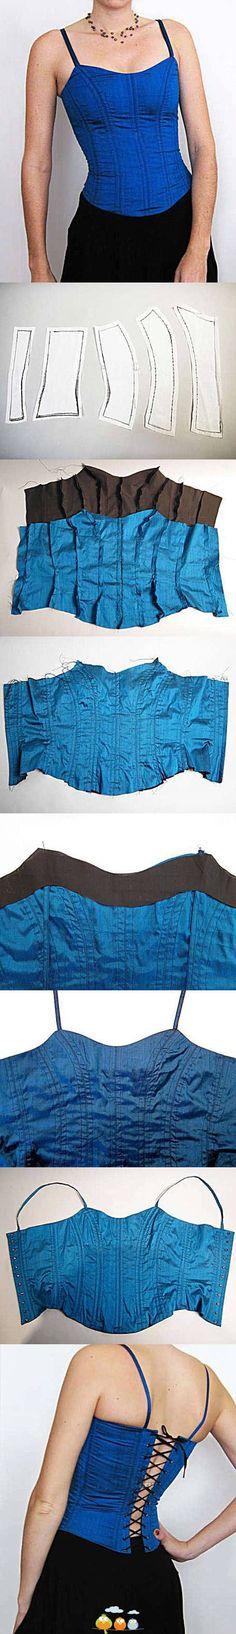 Diy corset